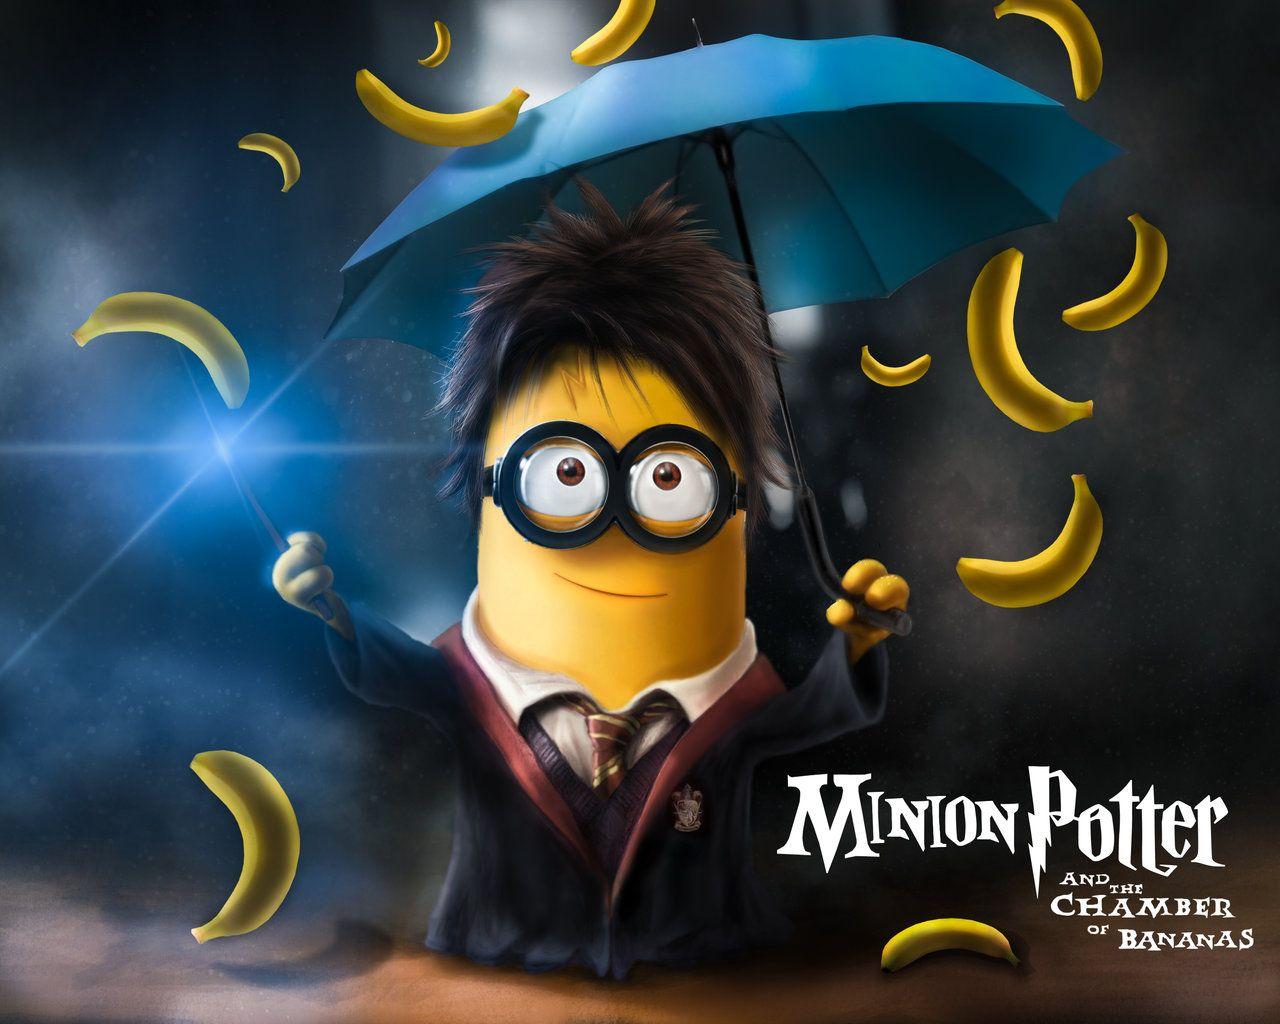 Minion + Bananas + Harry Potter U003d Minion Potter And The Chamber Of Bananas.